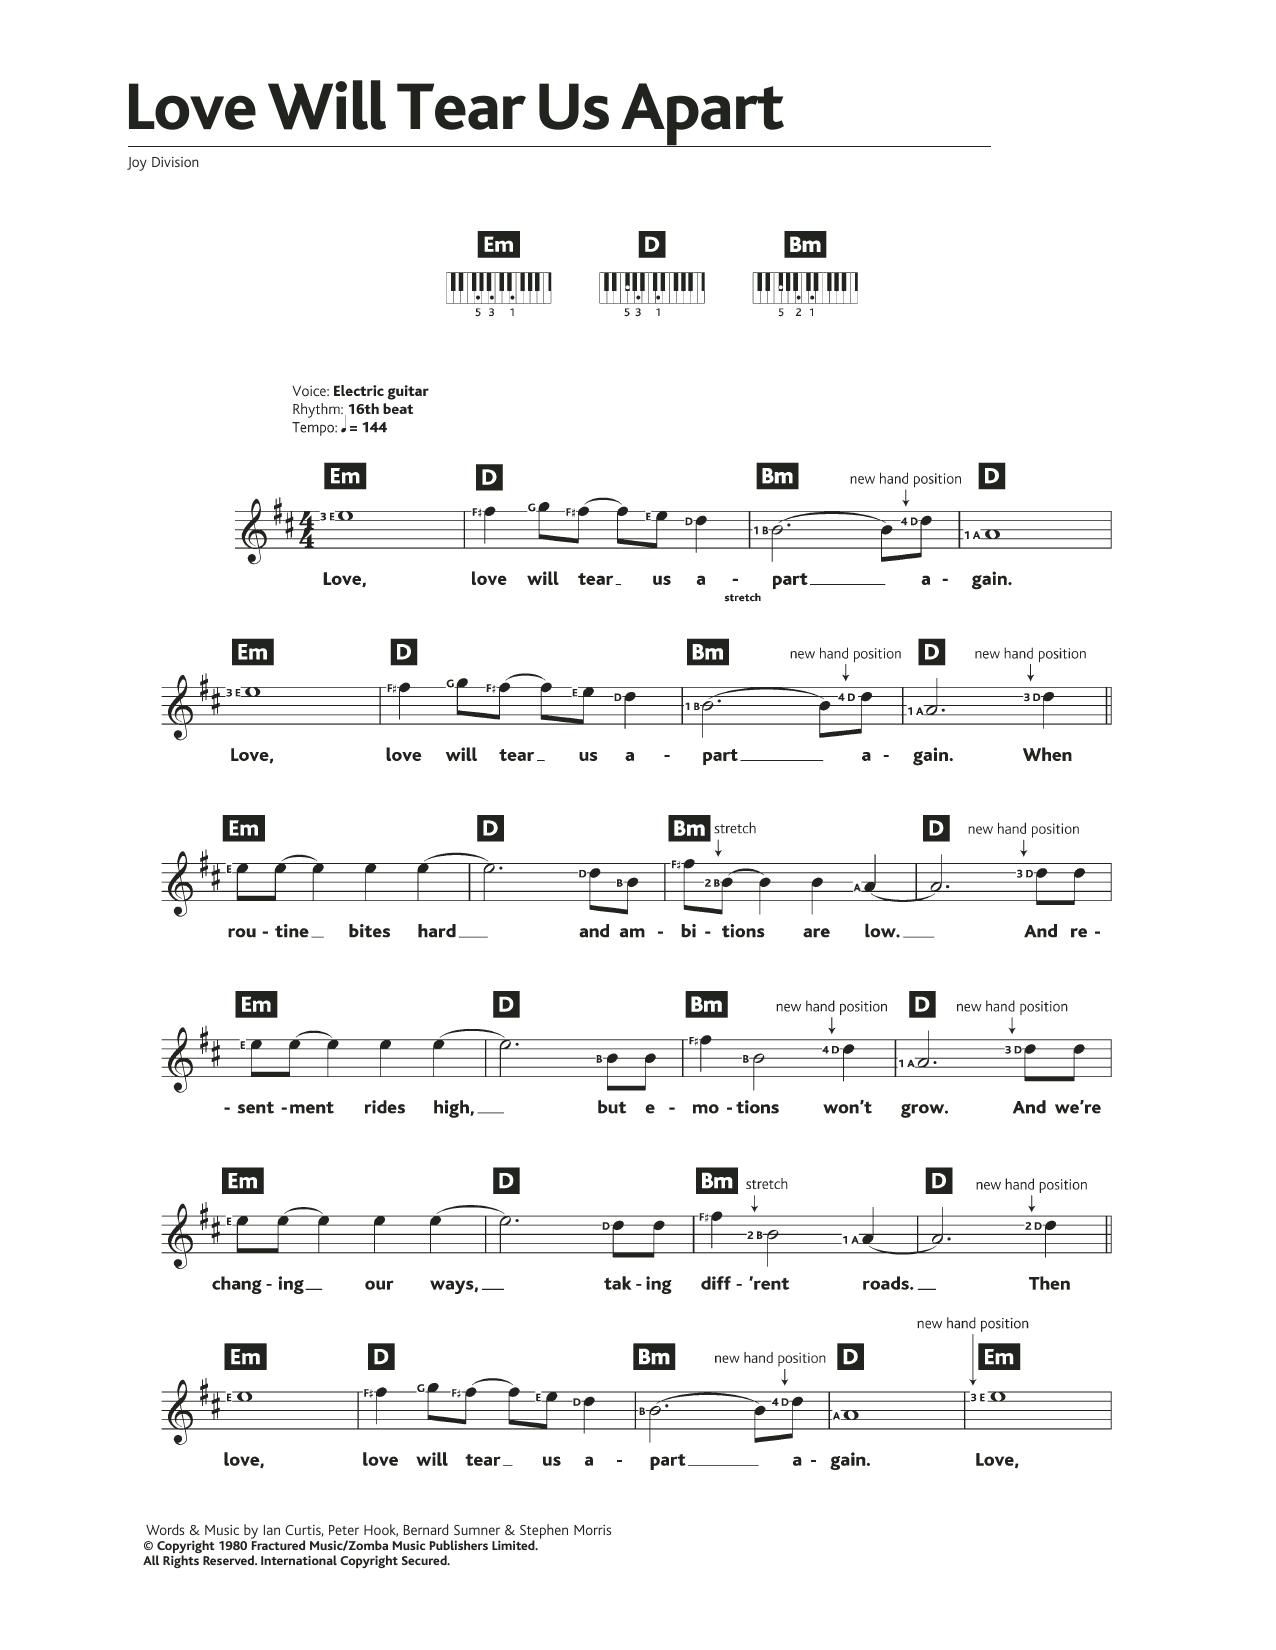 Love Will Tear Us Apart Sheet Music